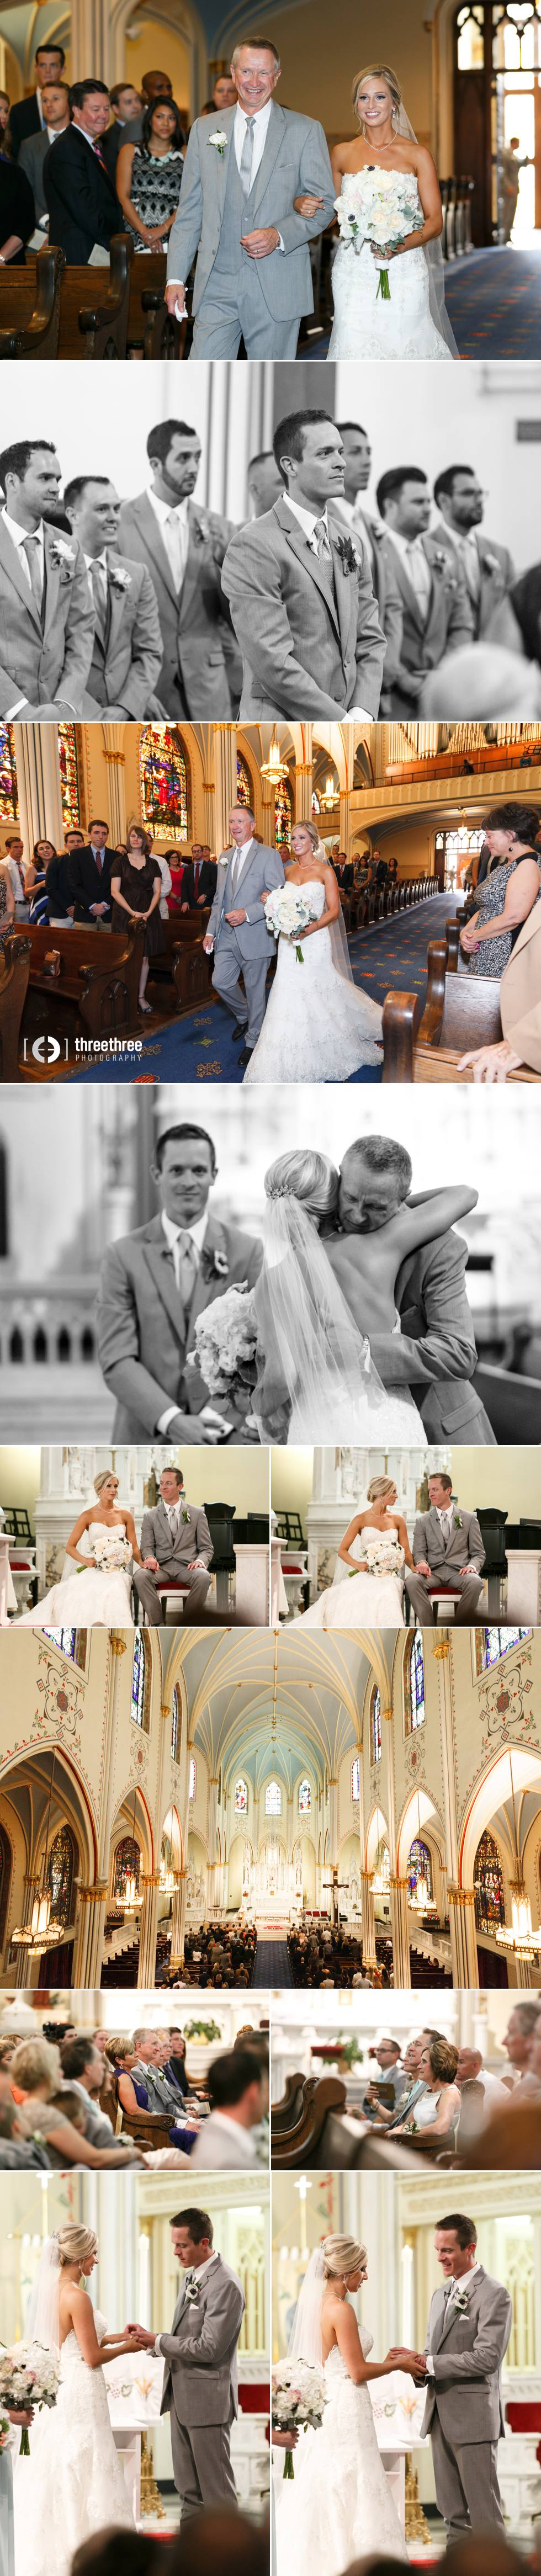 Natalie_AJ_wedding 5